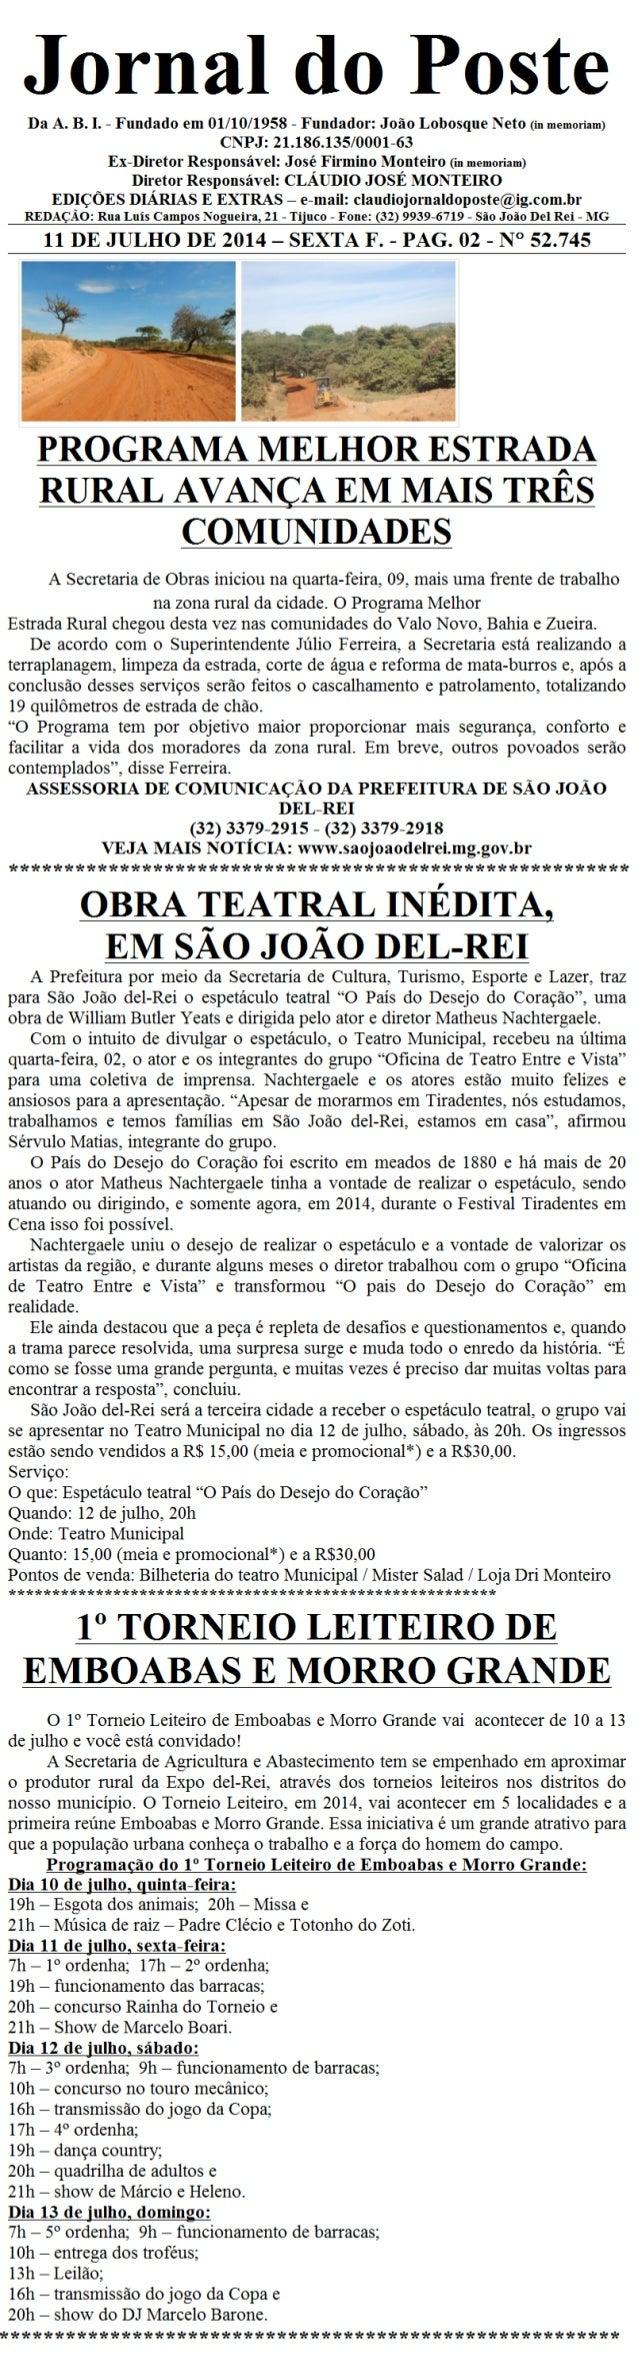 Jornal do poste 22 b 2